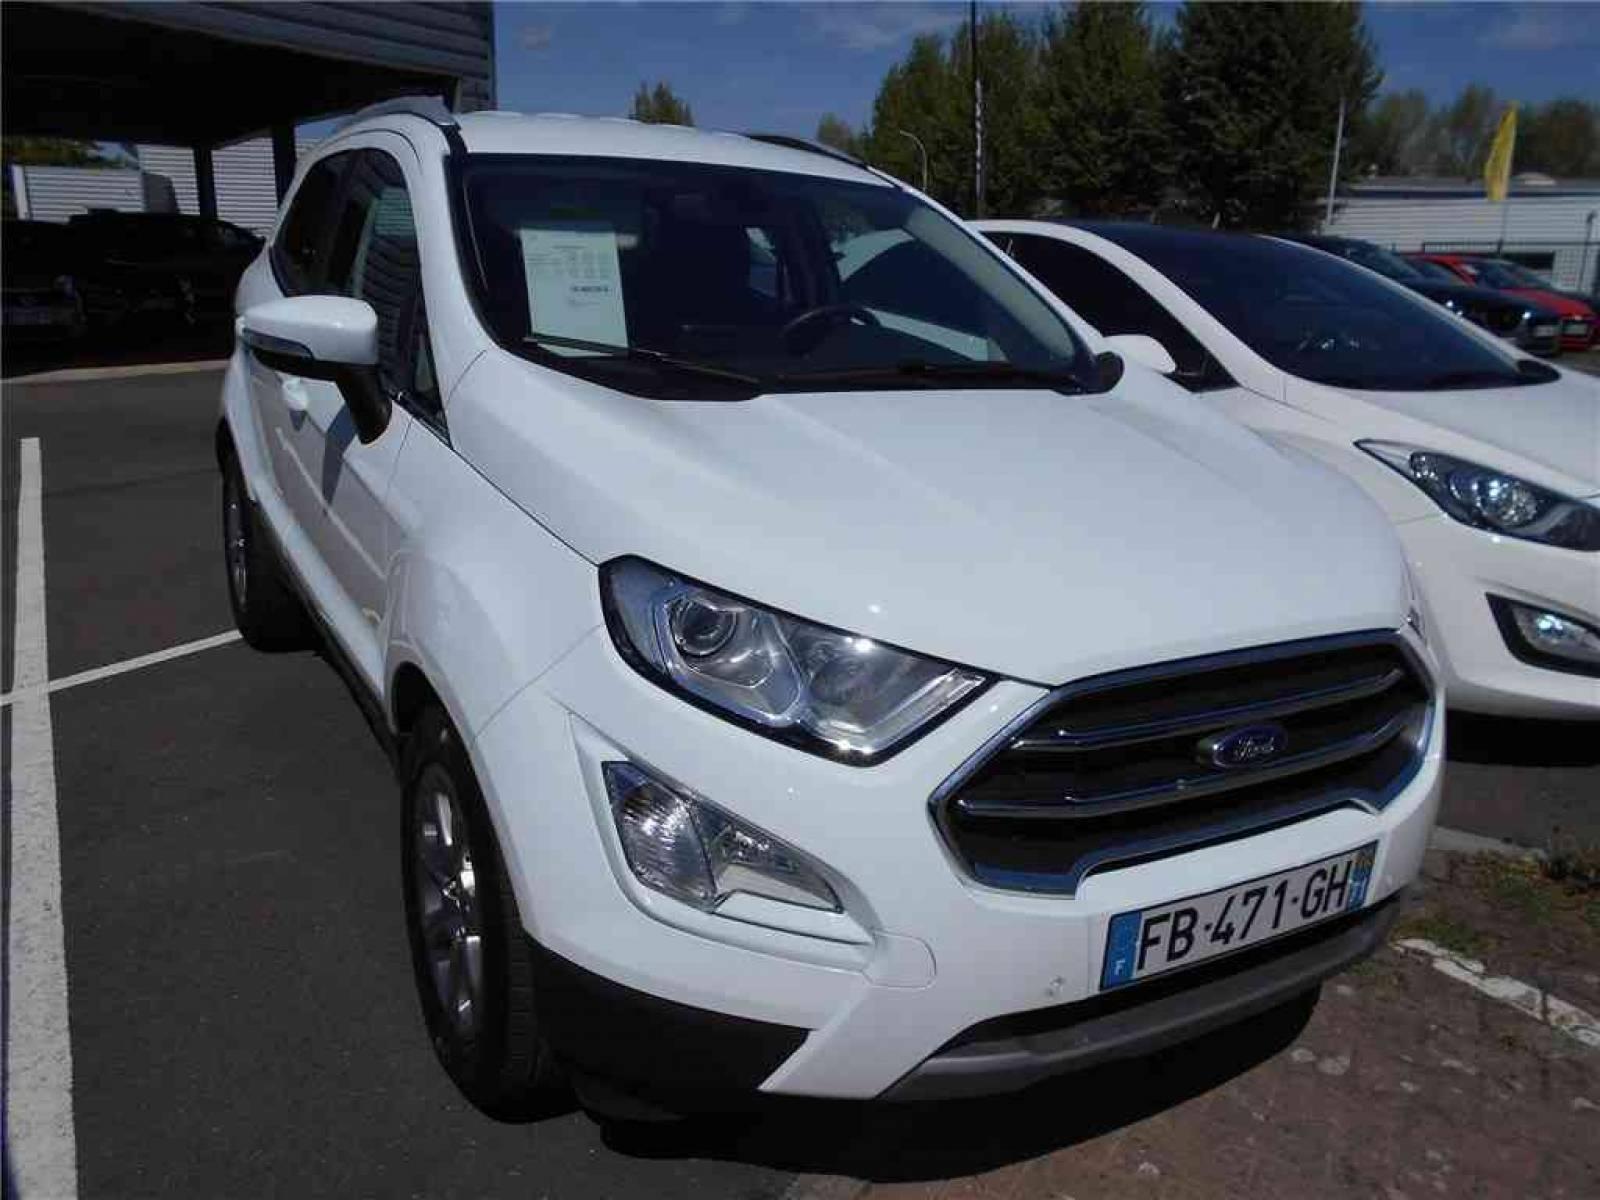 FORD EcoSport 1.0 EcoBoost 125 BVM6 - véhicule d'occasion - Groupe Guillet - Chalon Automobiles - 71100 - Chalon-sur-Saône - 21